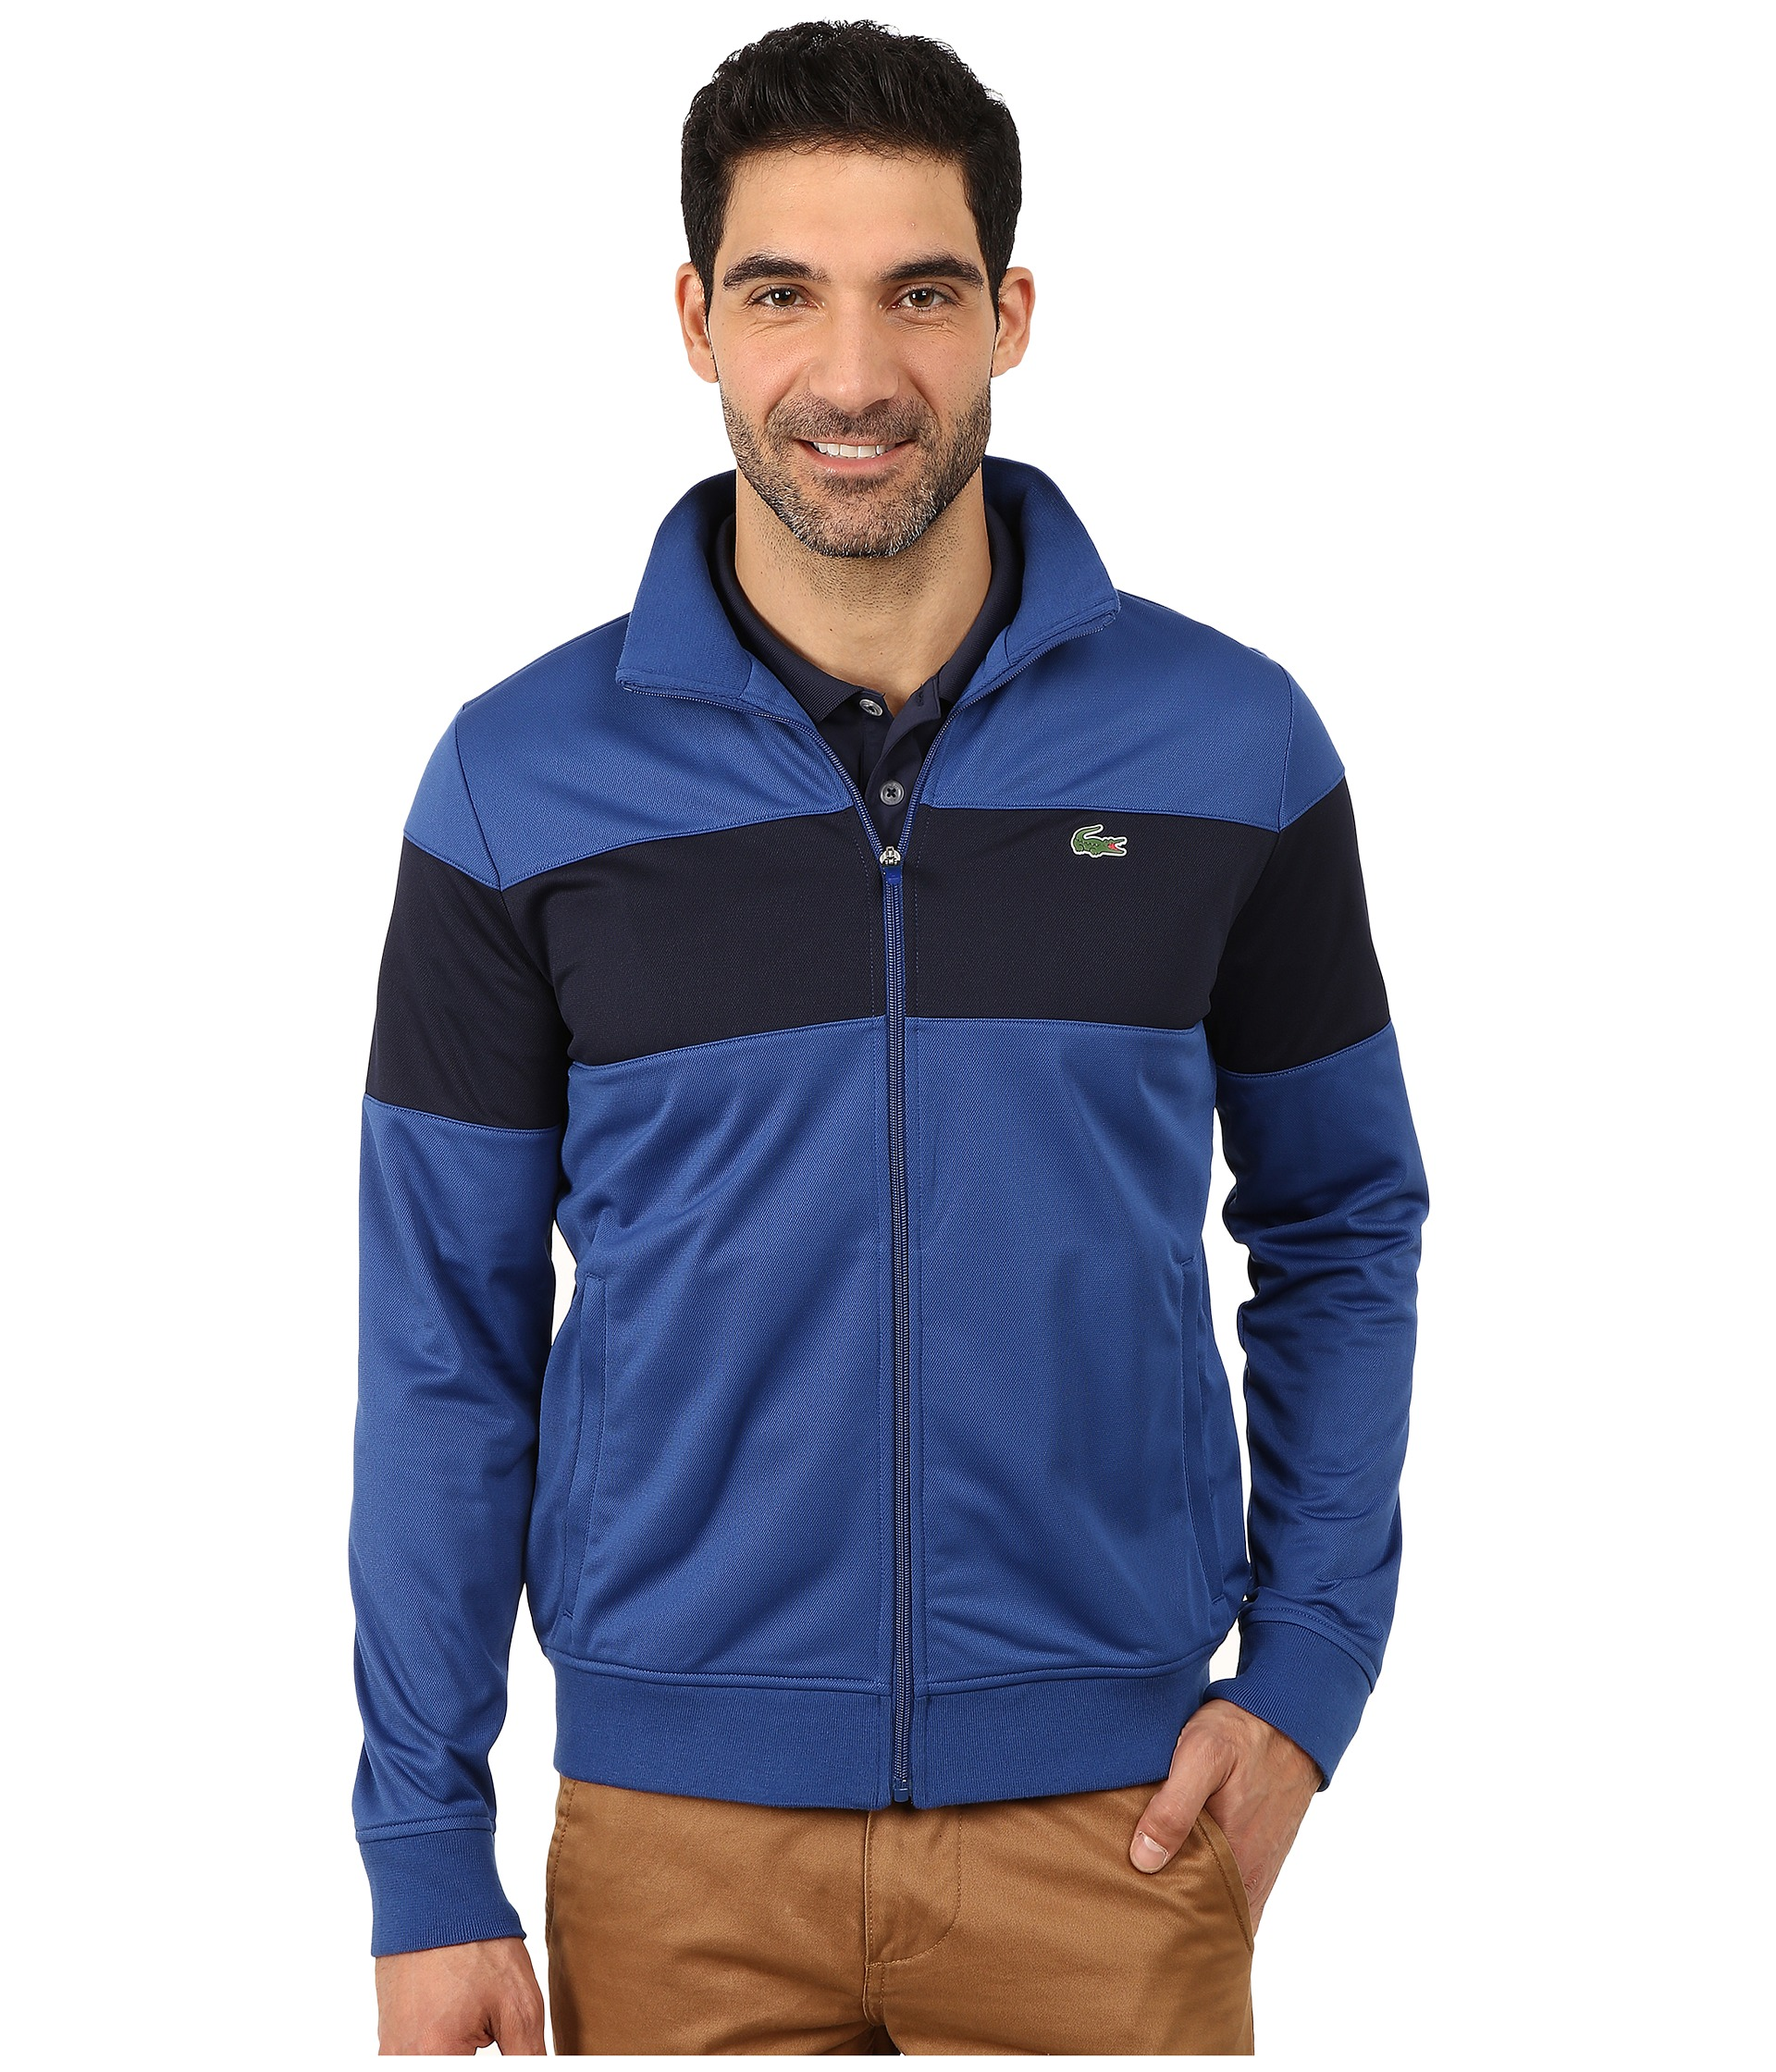 lacoste sport track jacket with bold chest stripe. Black Bedroom Furniture Sets. Home Design Ideas